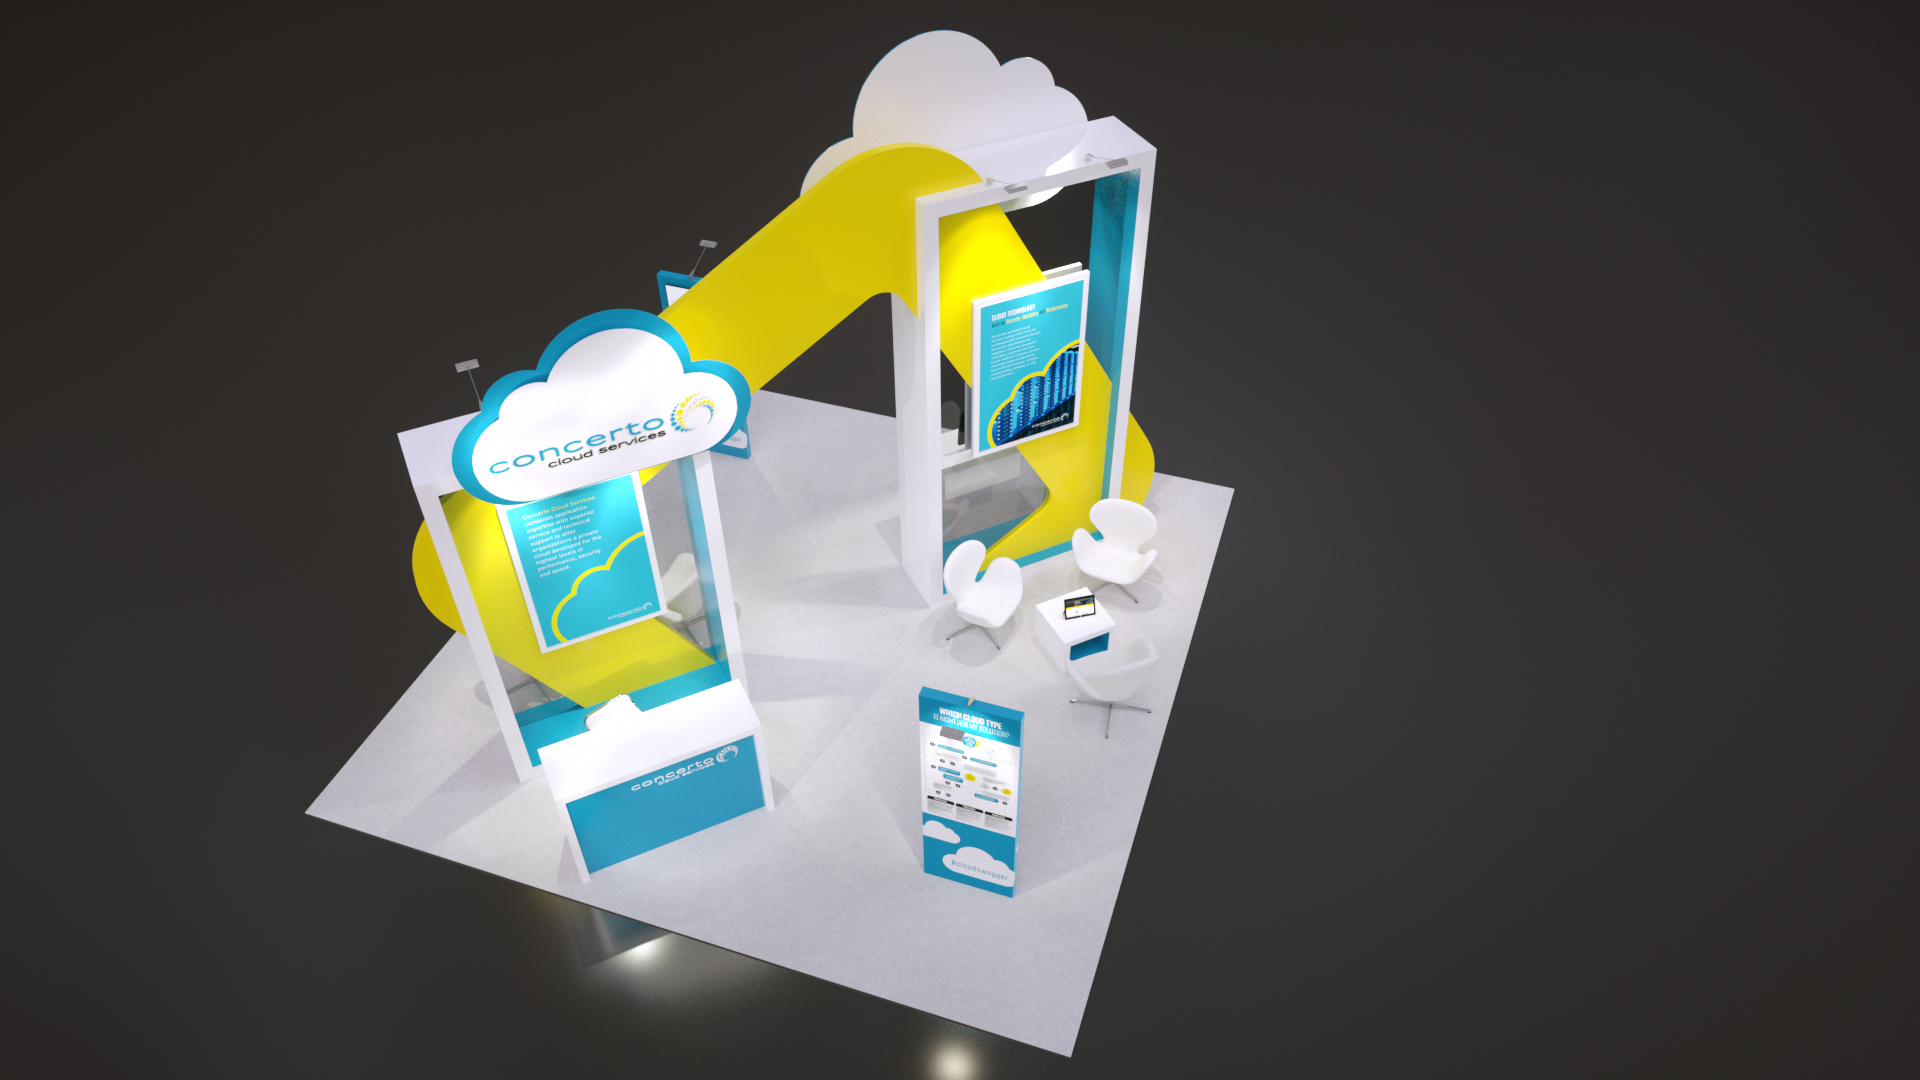 3053 - Concerto Cloud Services - Microsoft Envision 2016 - View 12.jpg